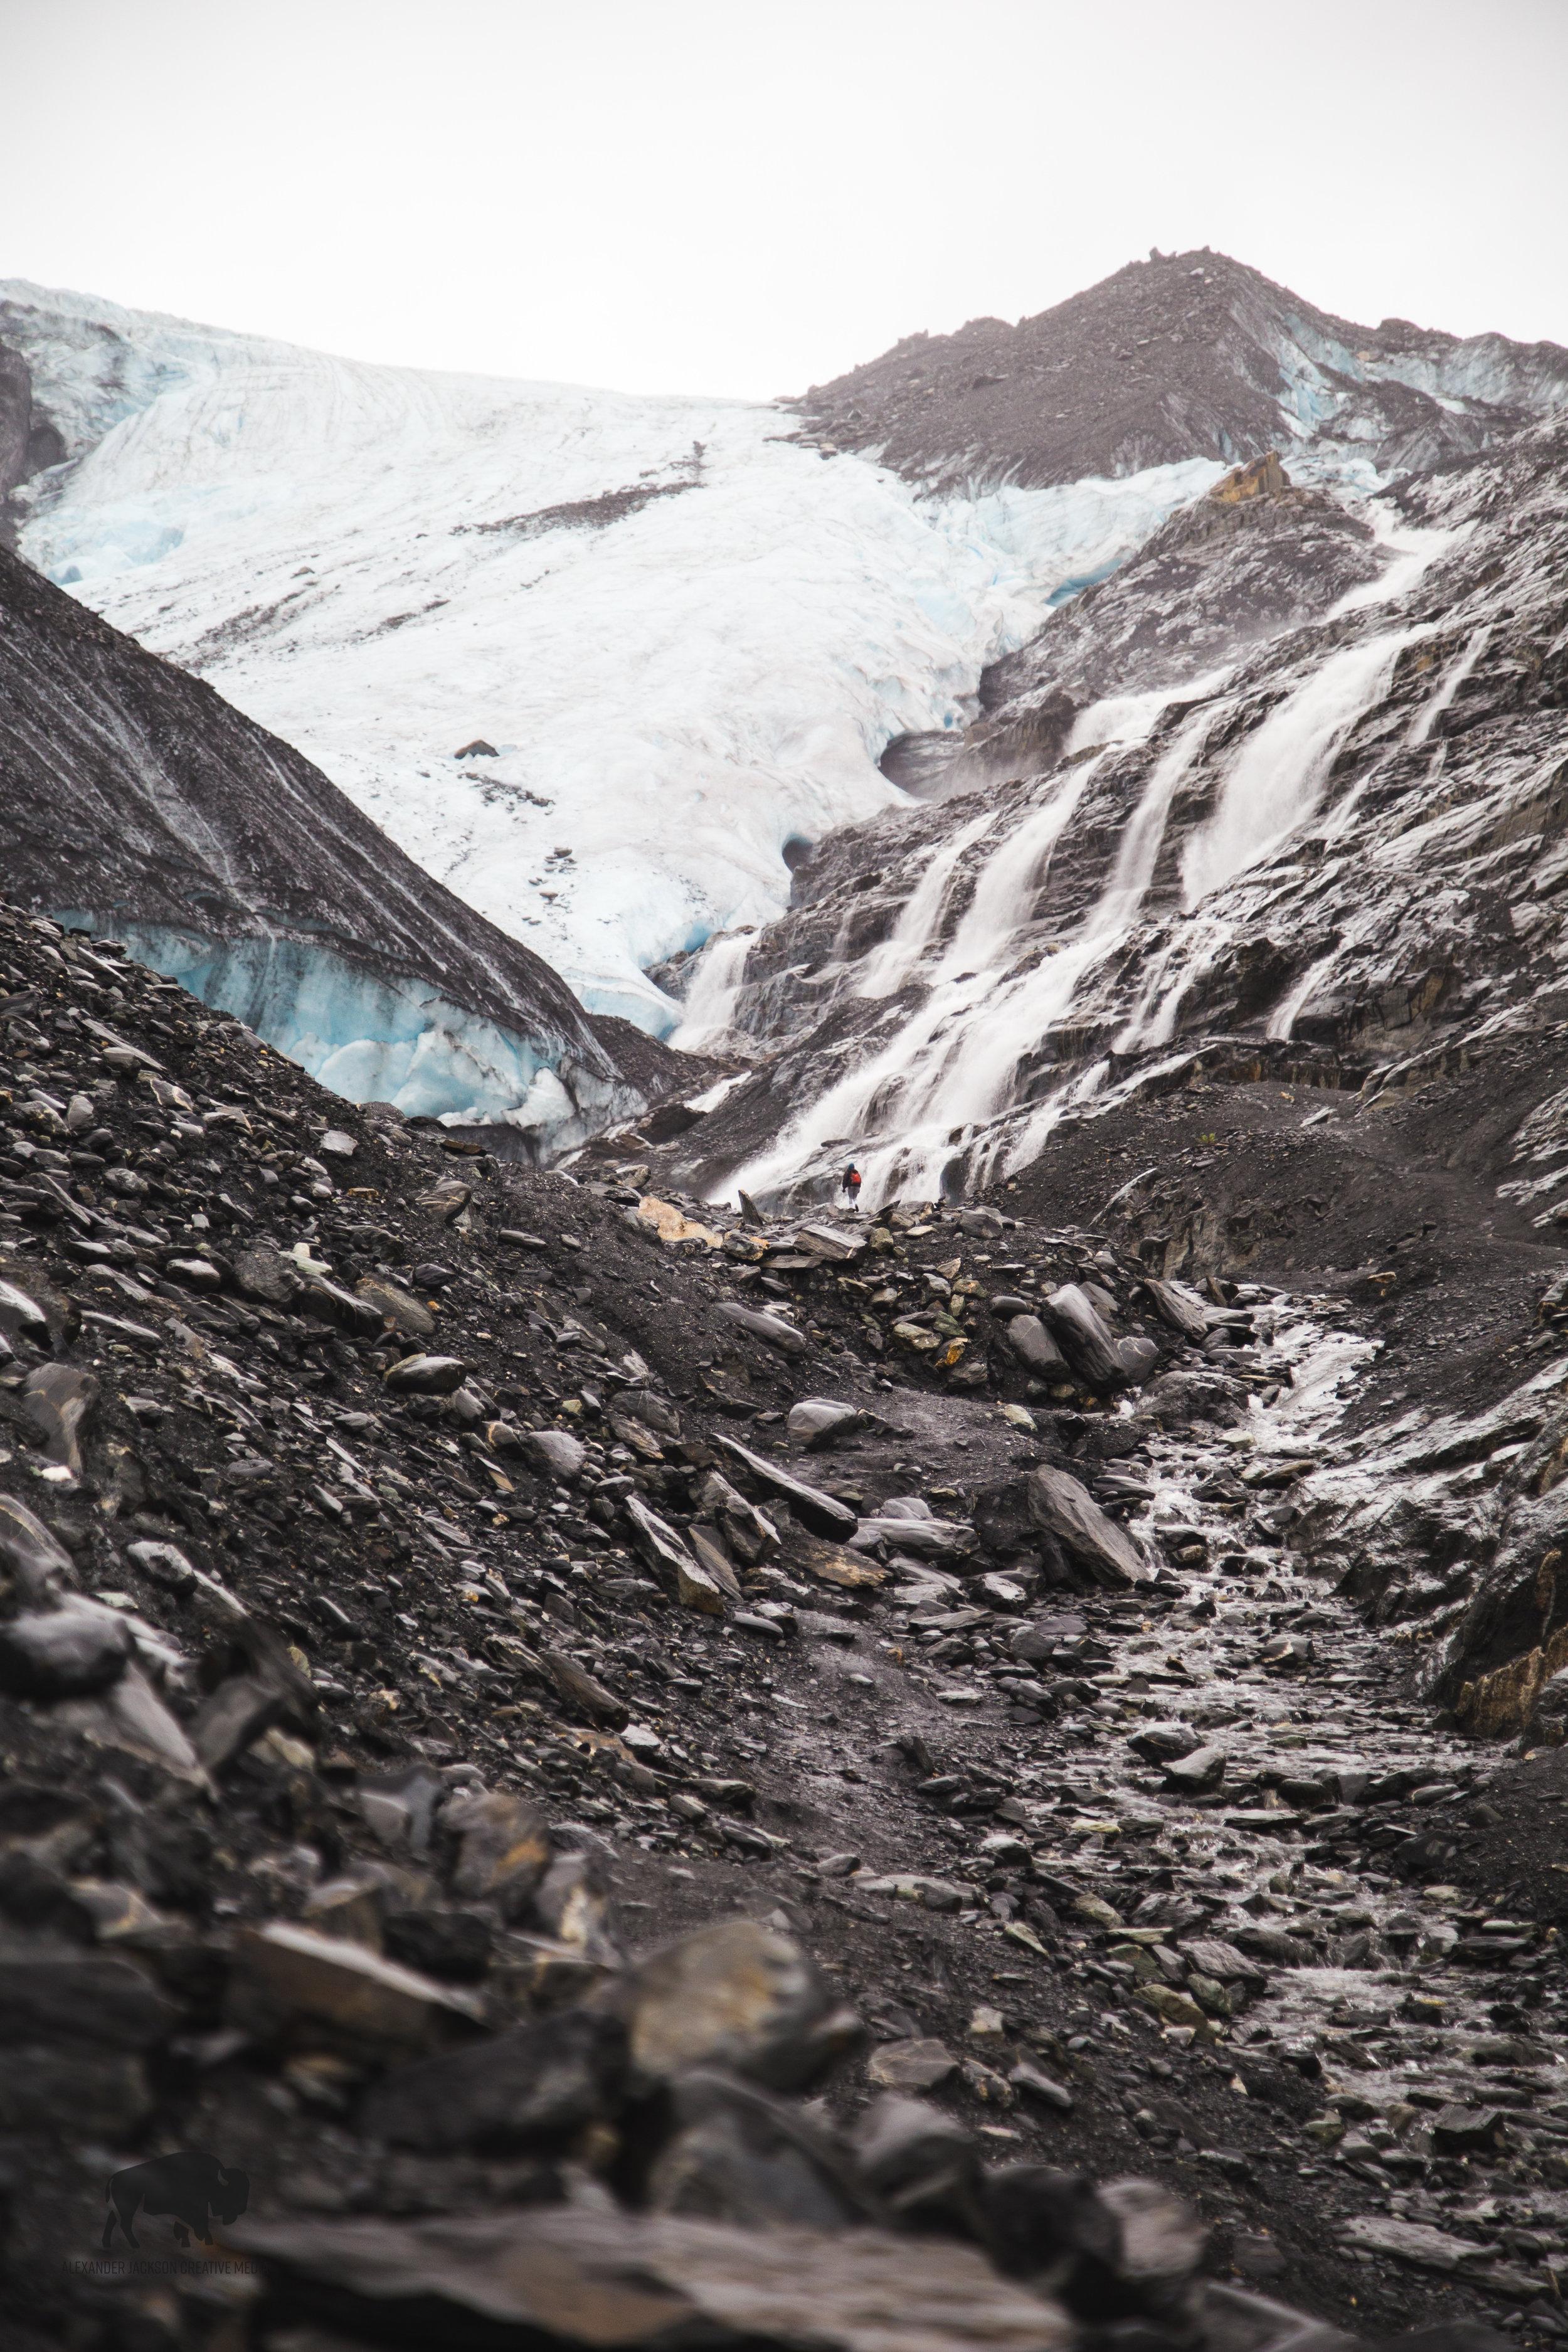 Approaching Worthington Glacier